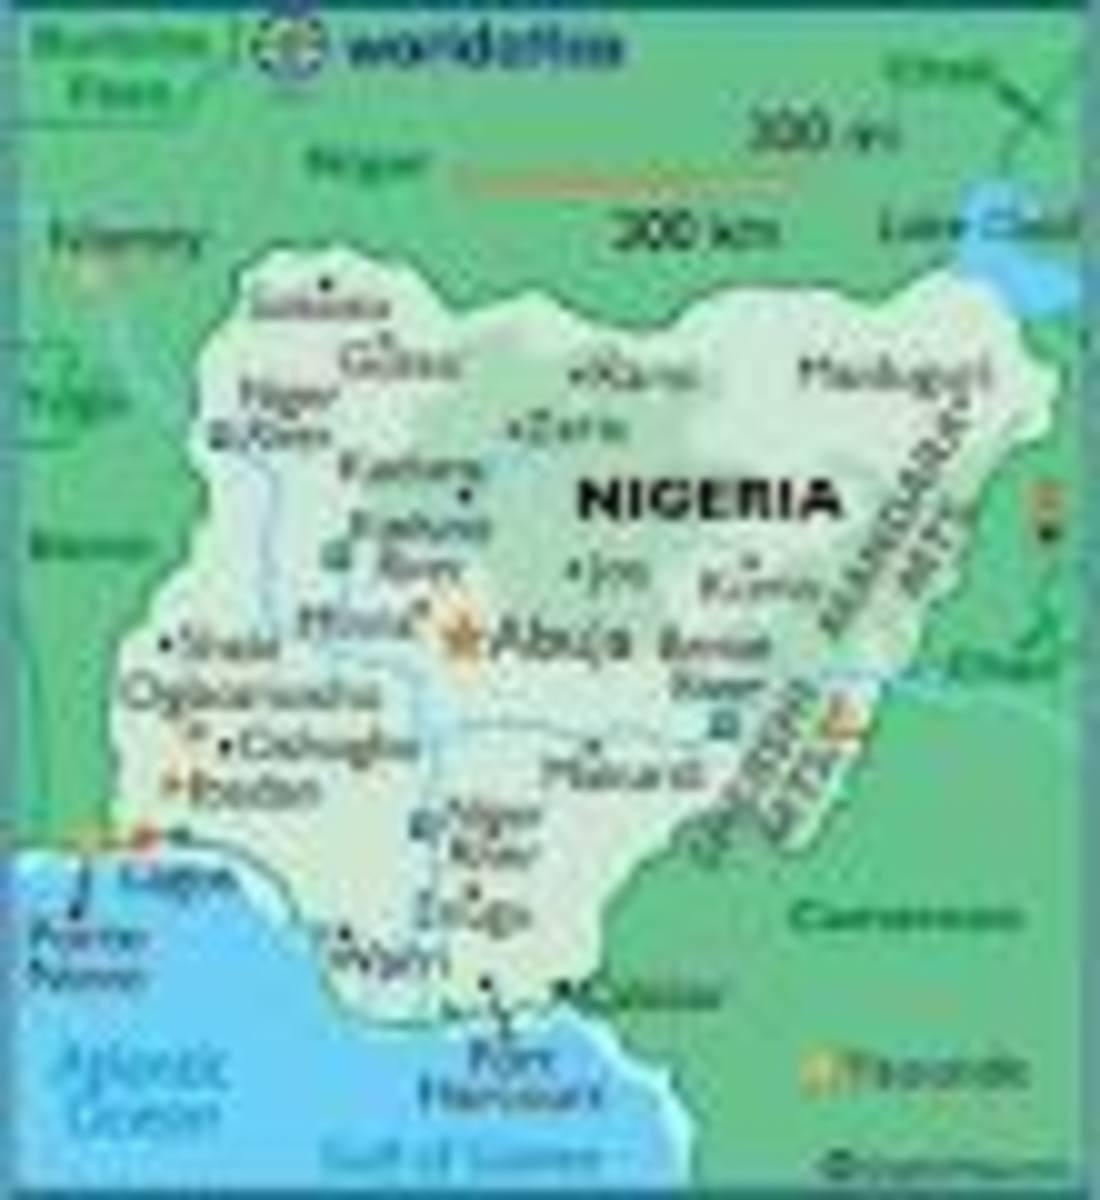 dating a divorced nigerian man